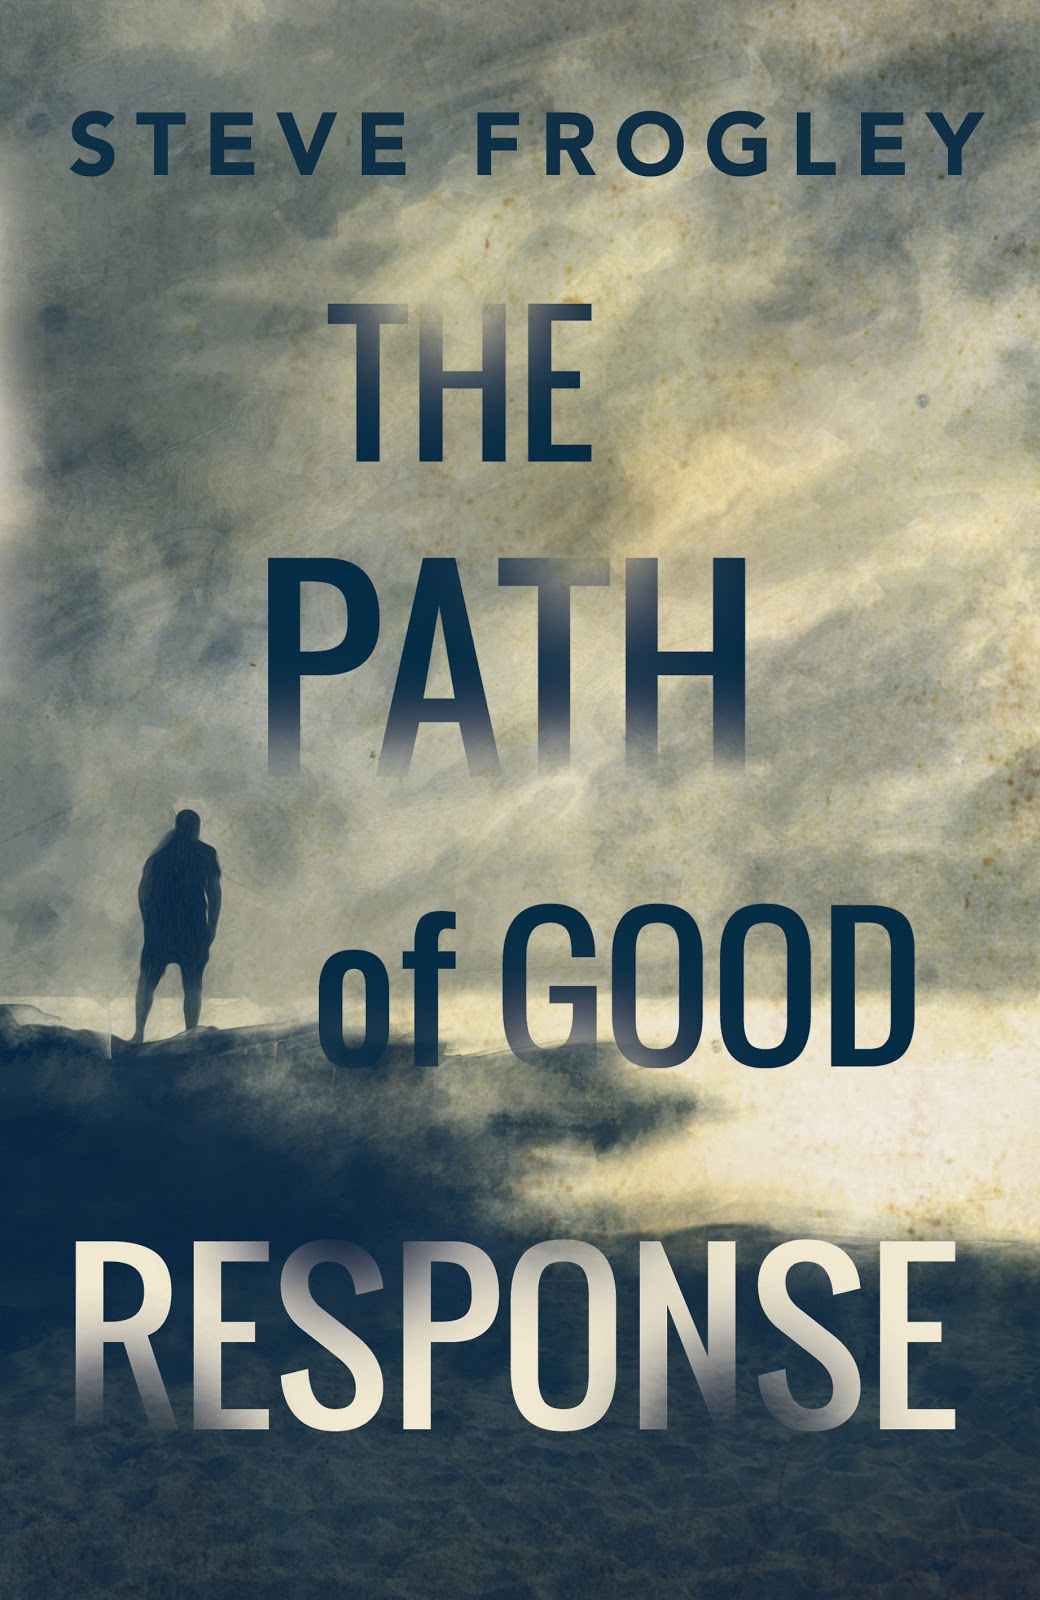 the path of good response